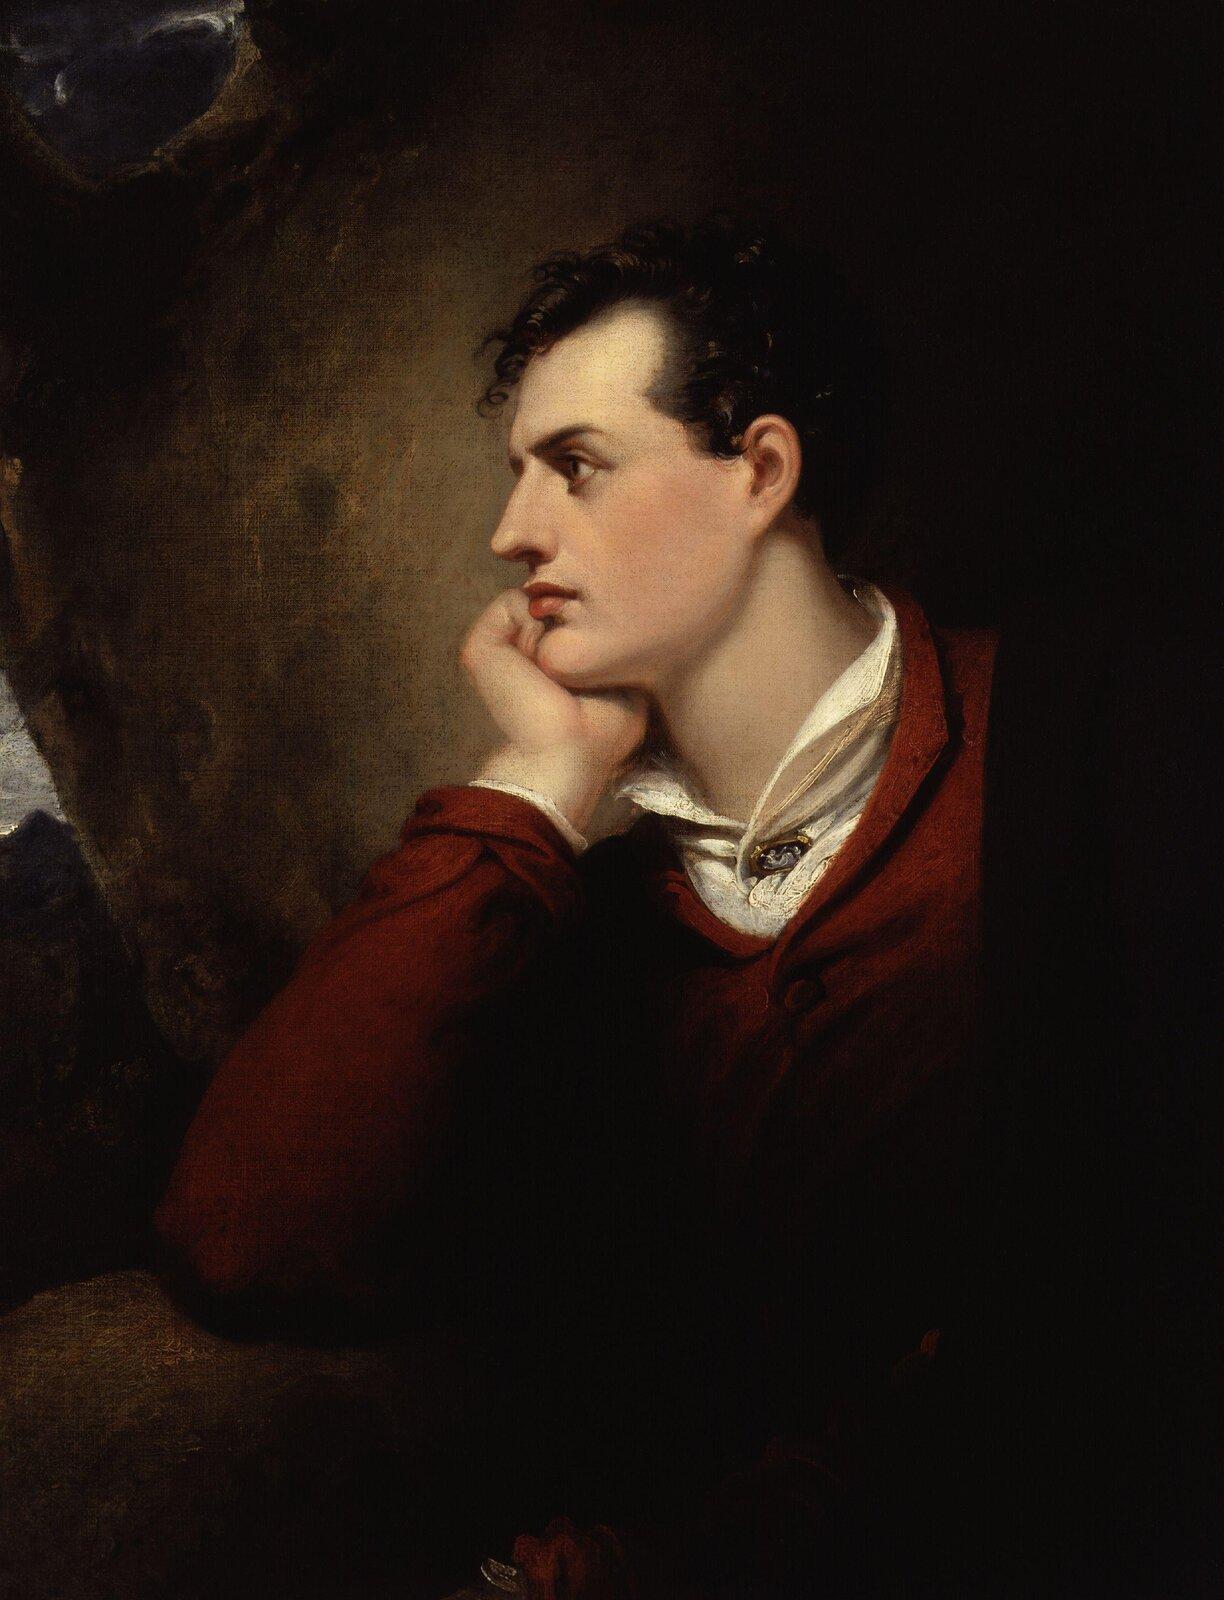 George Gordon Byron Źródło: Richard Westall, George Gordon Byron, 1813, domena publiczna.